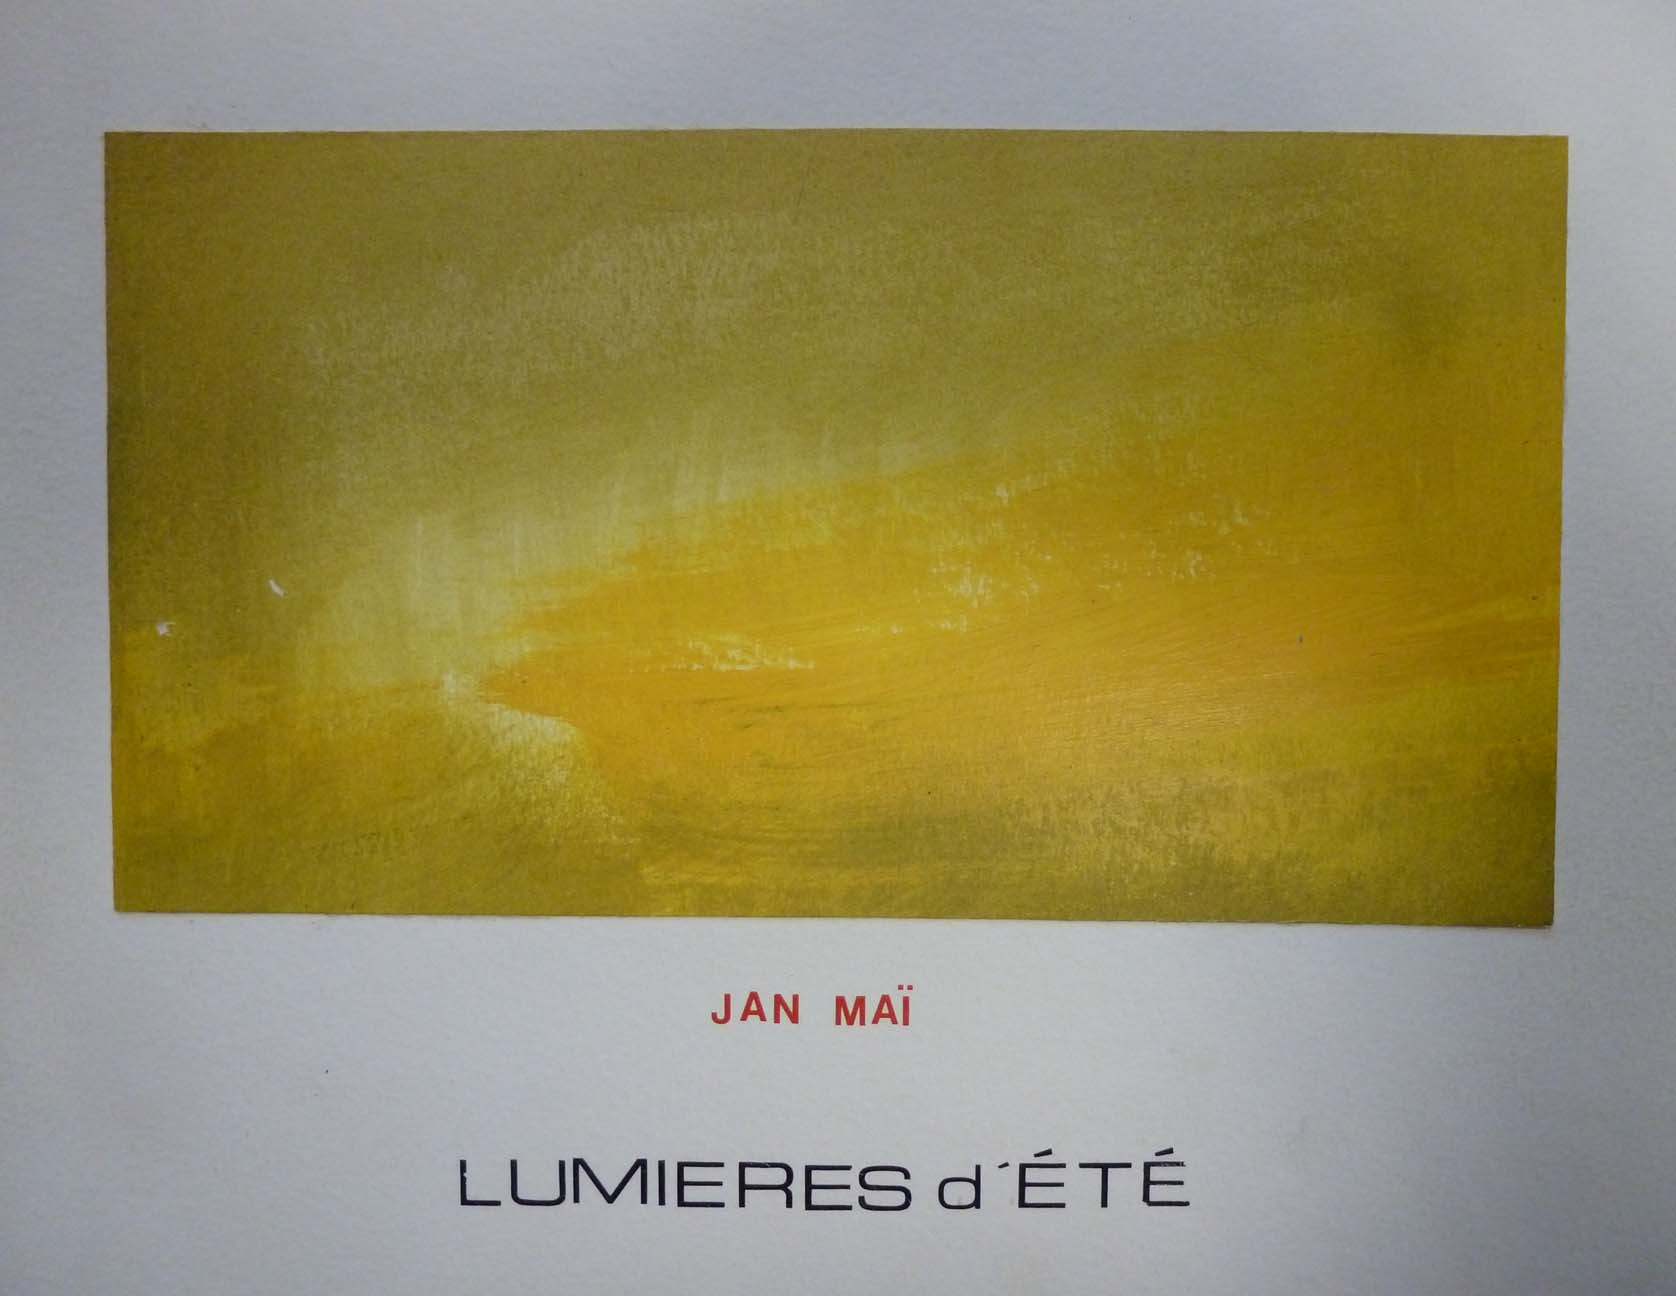 Jan Maï aout 2011 024pm.jpg